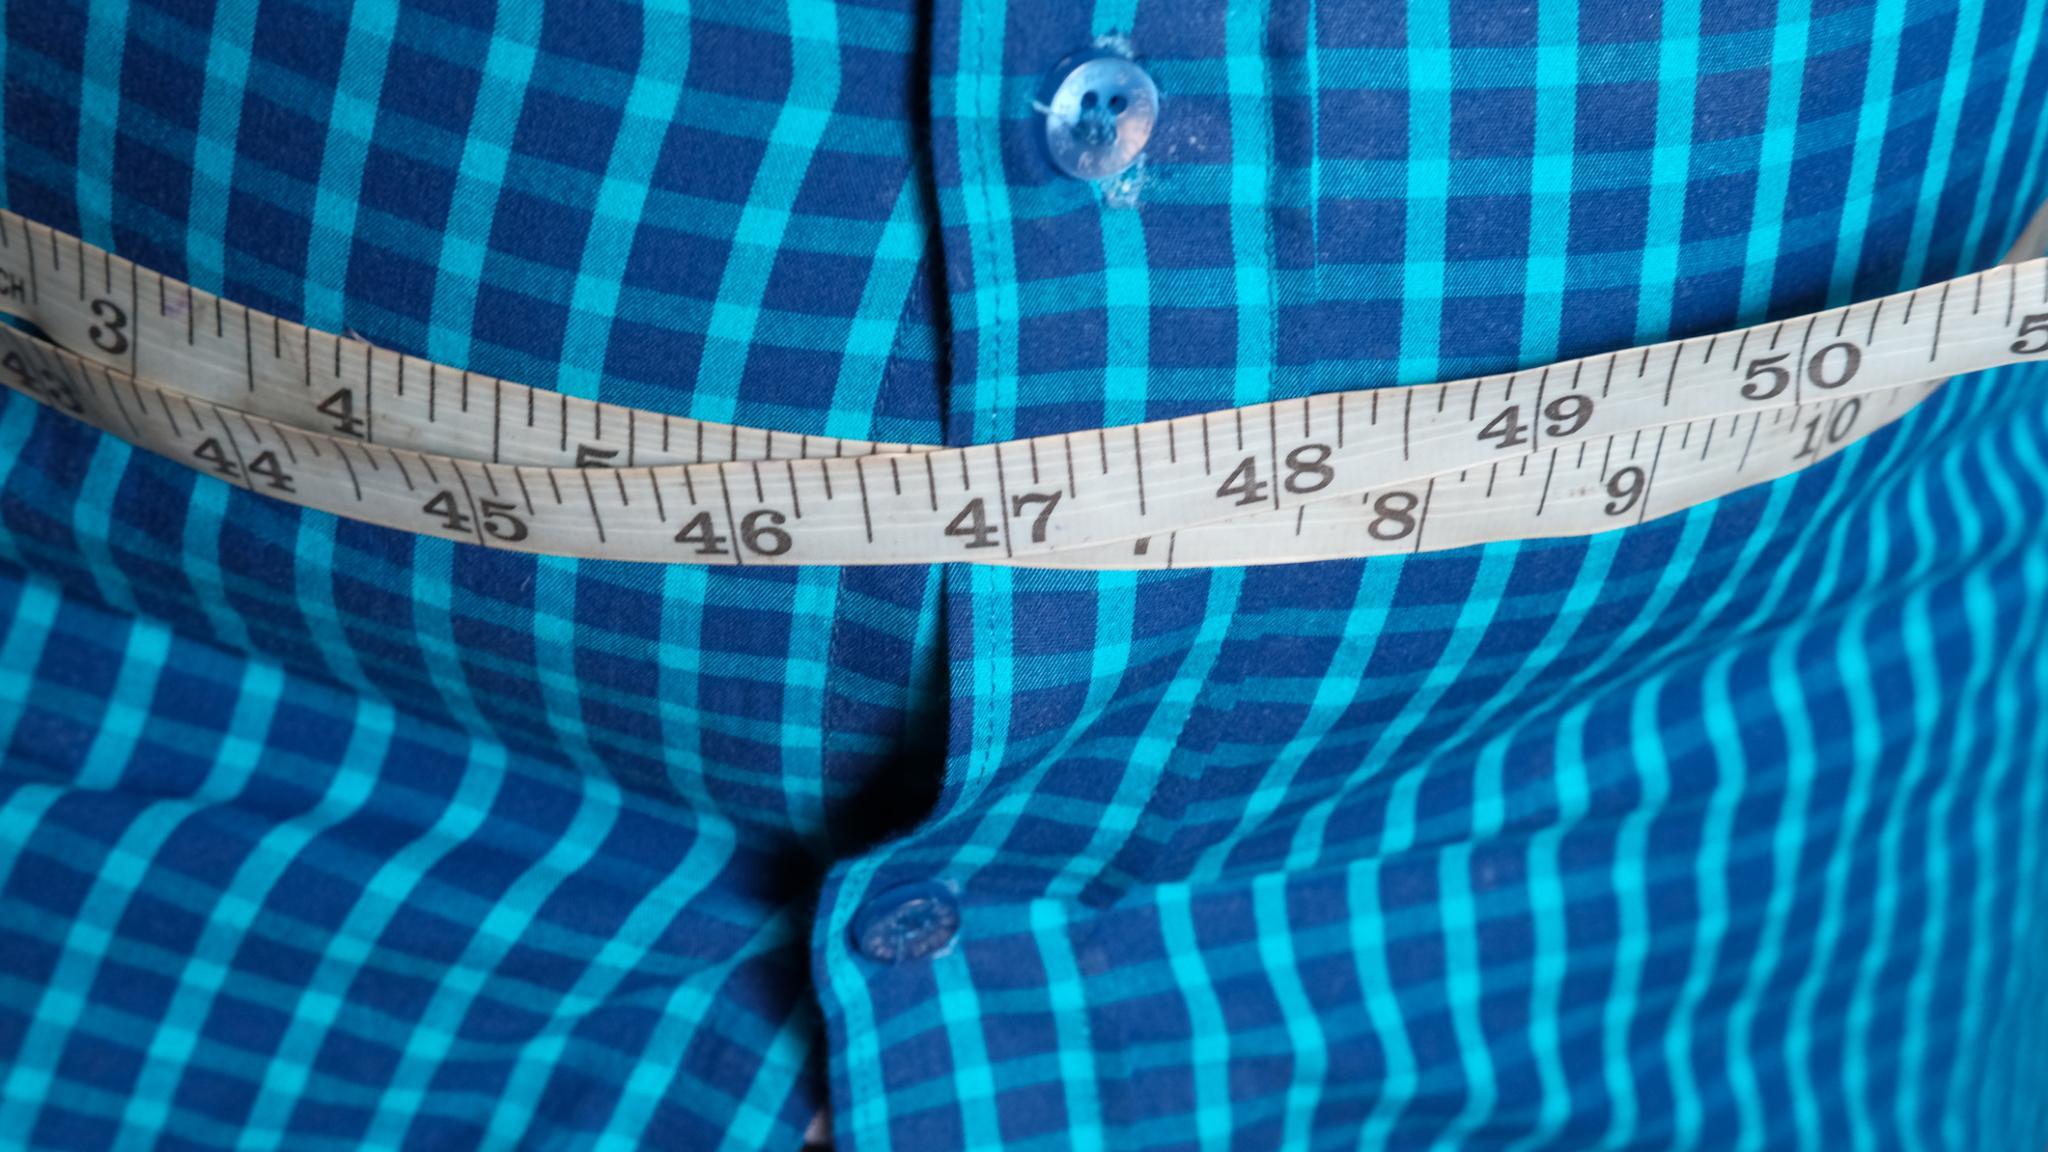 Гастрокин-1 заподозрили в провоцировании ожирения